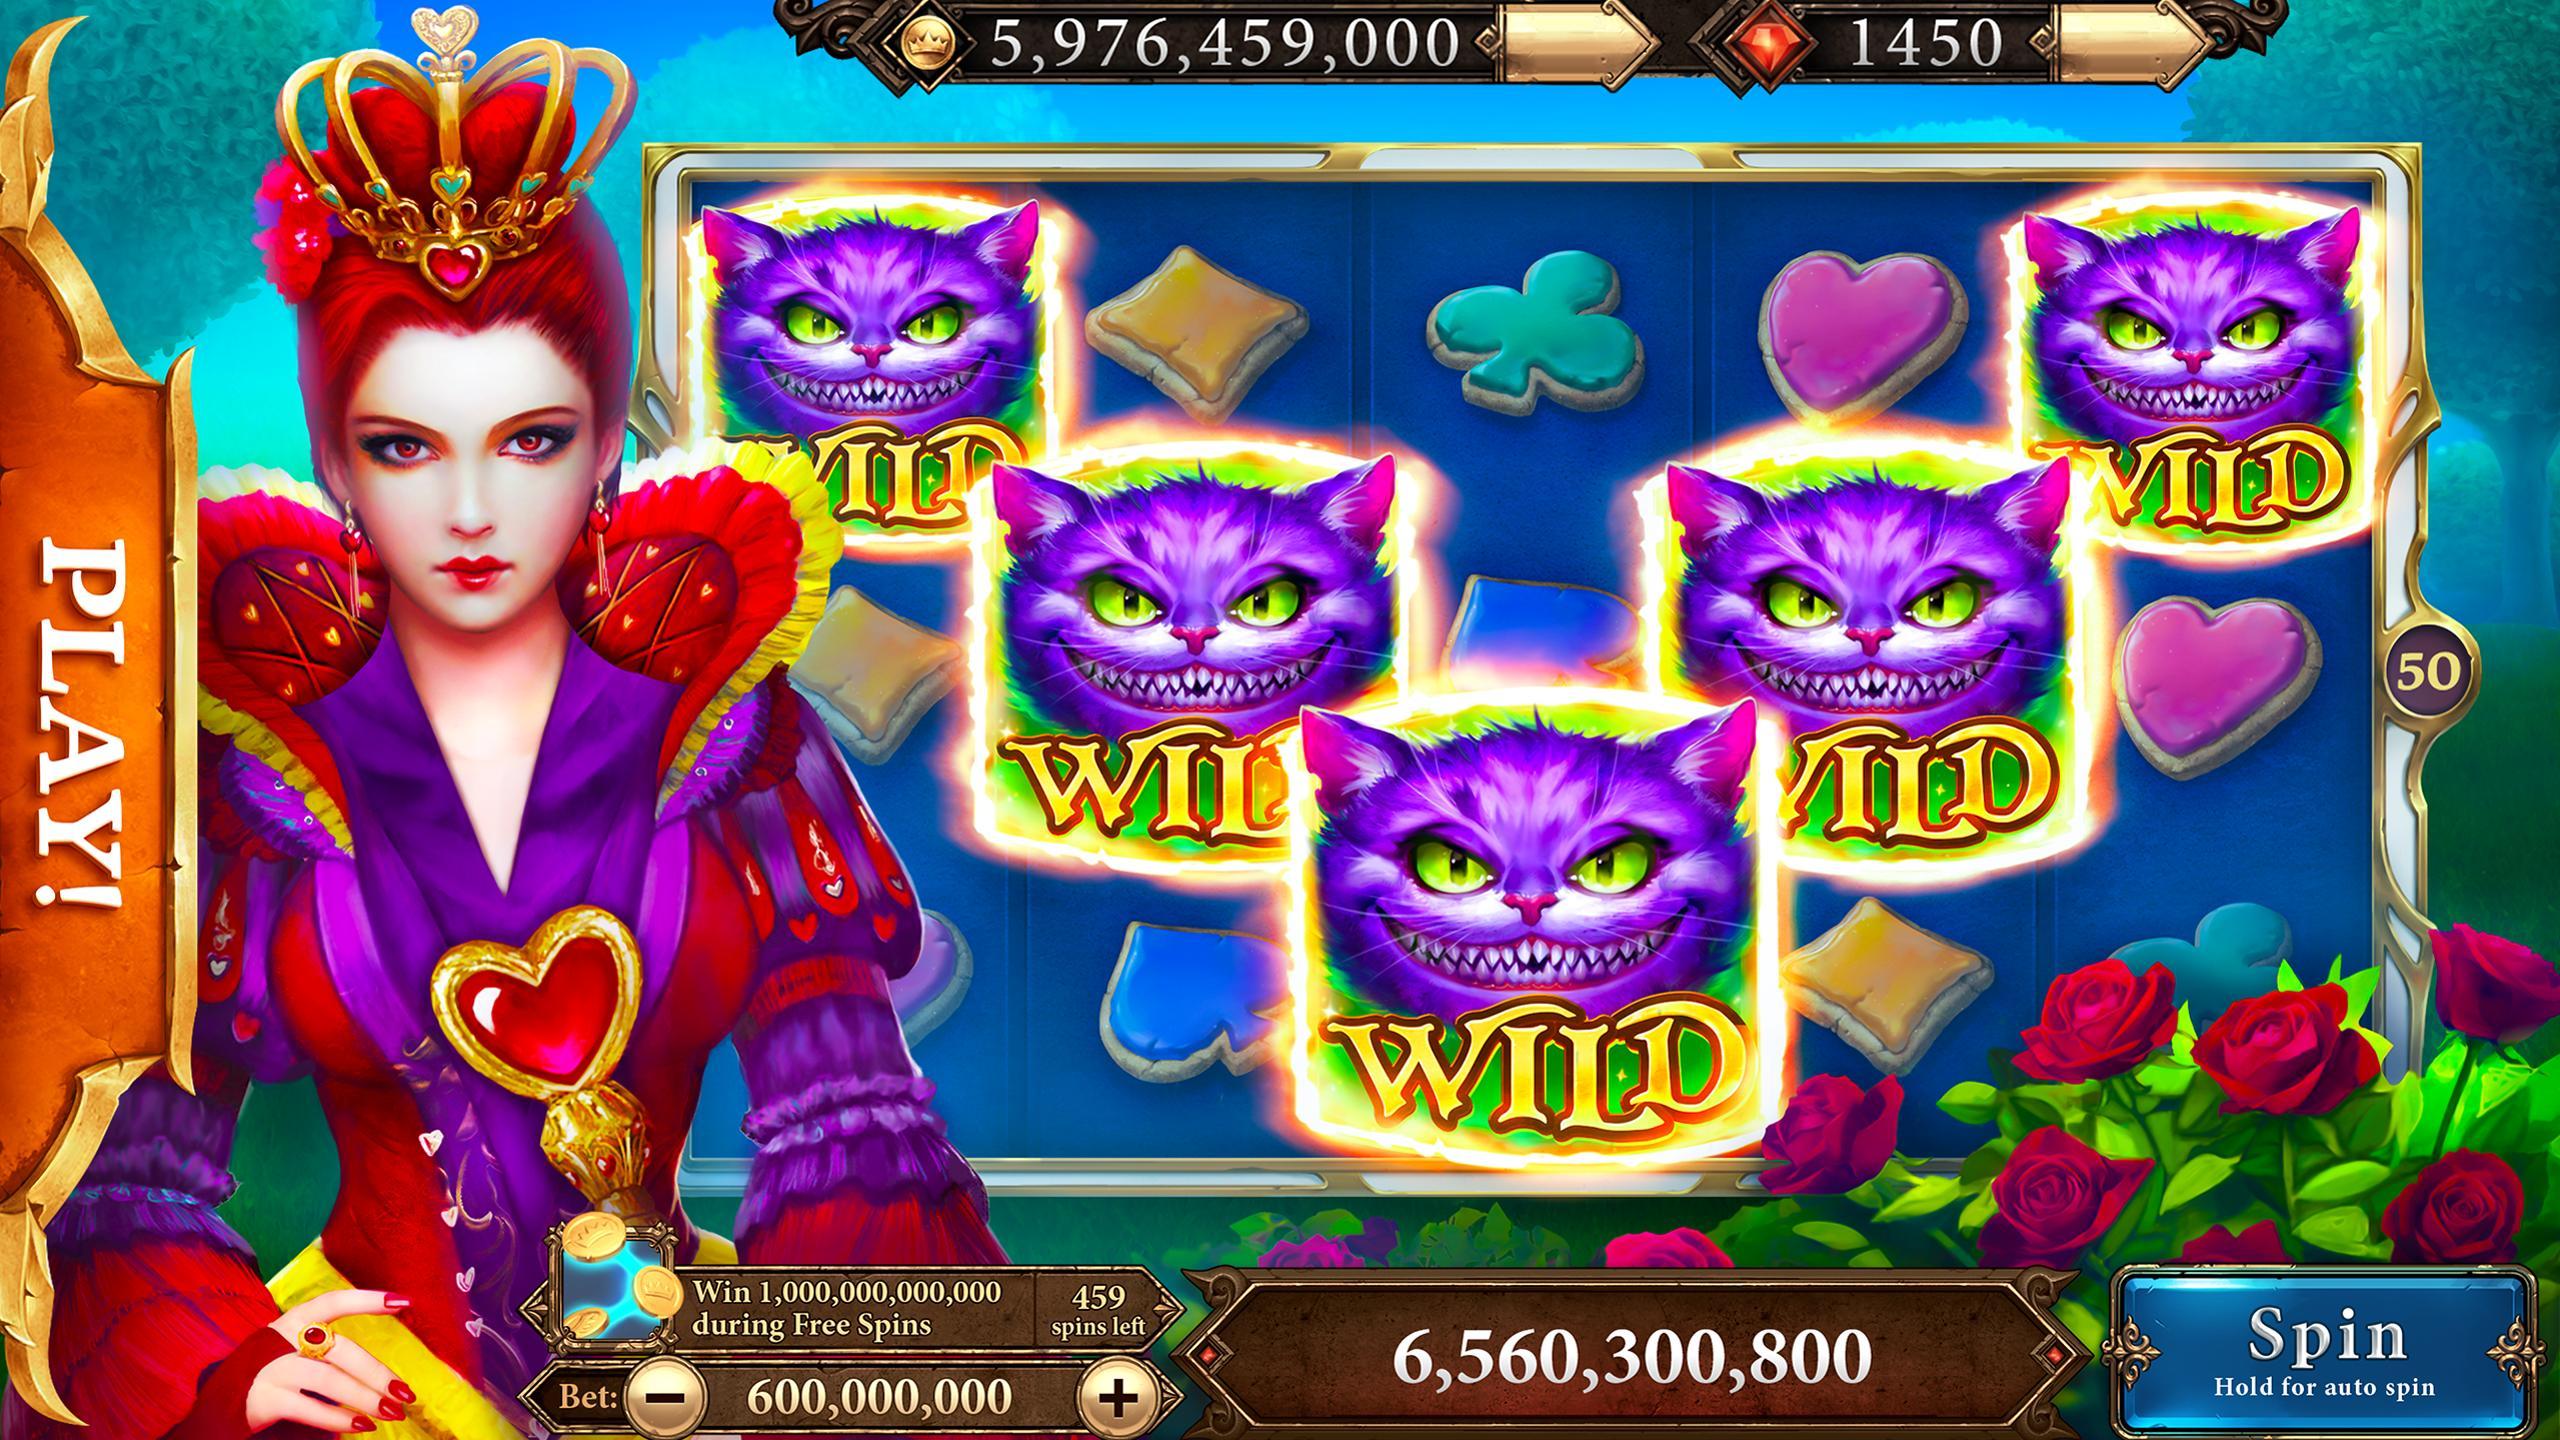 Scatter Slots Las Vegas Casino Game 777 Online 3.87.0 Screenshot 2